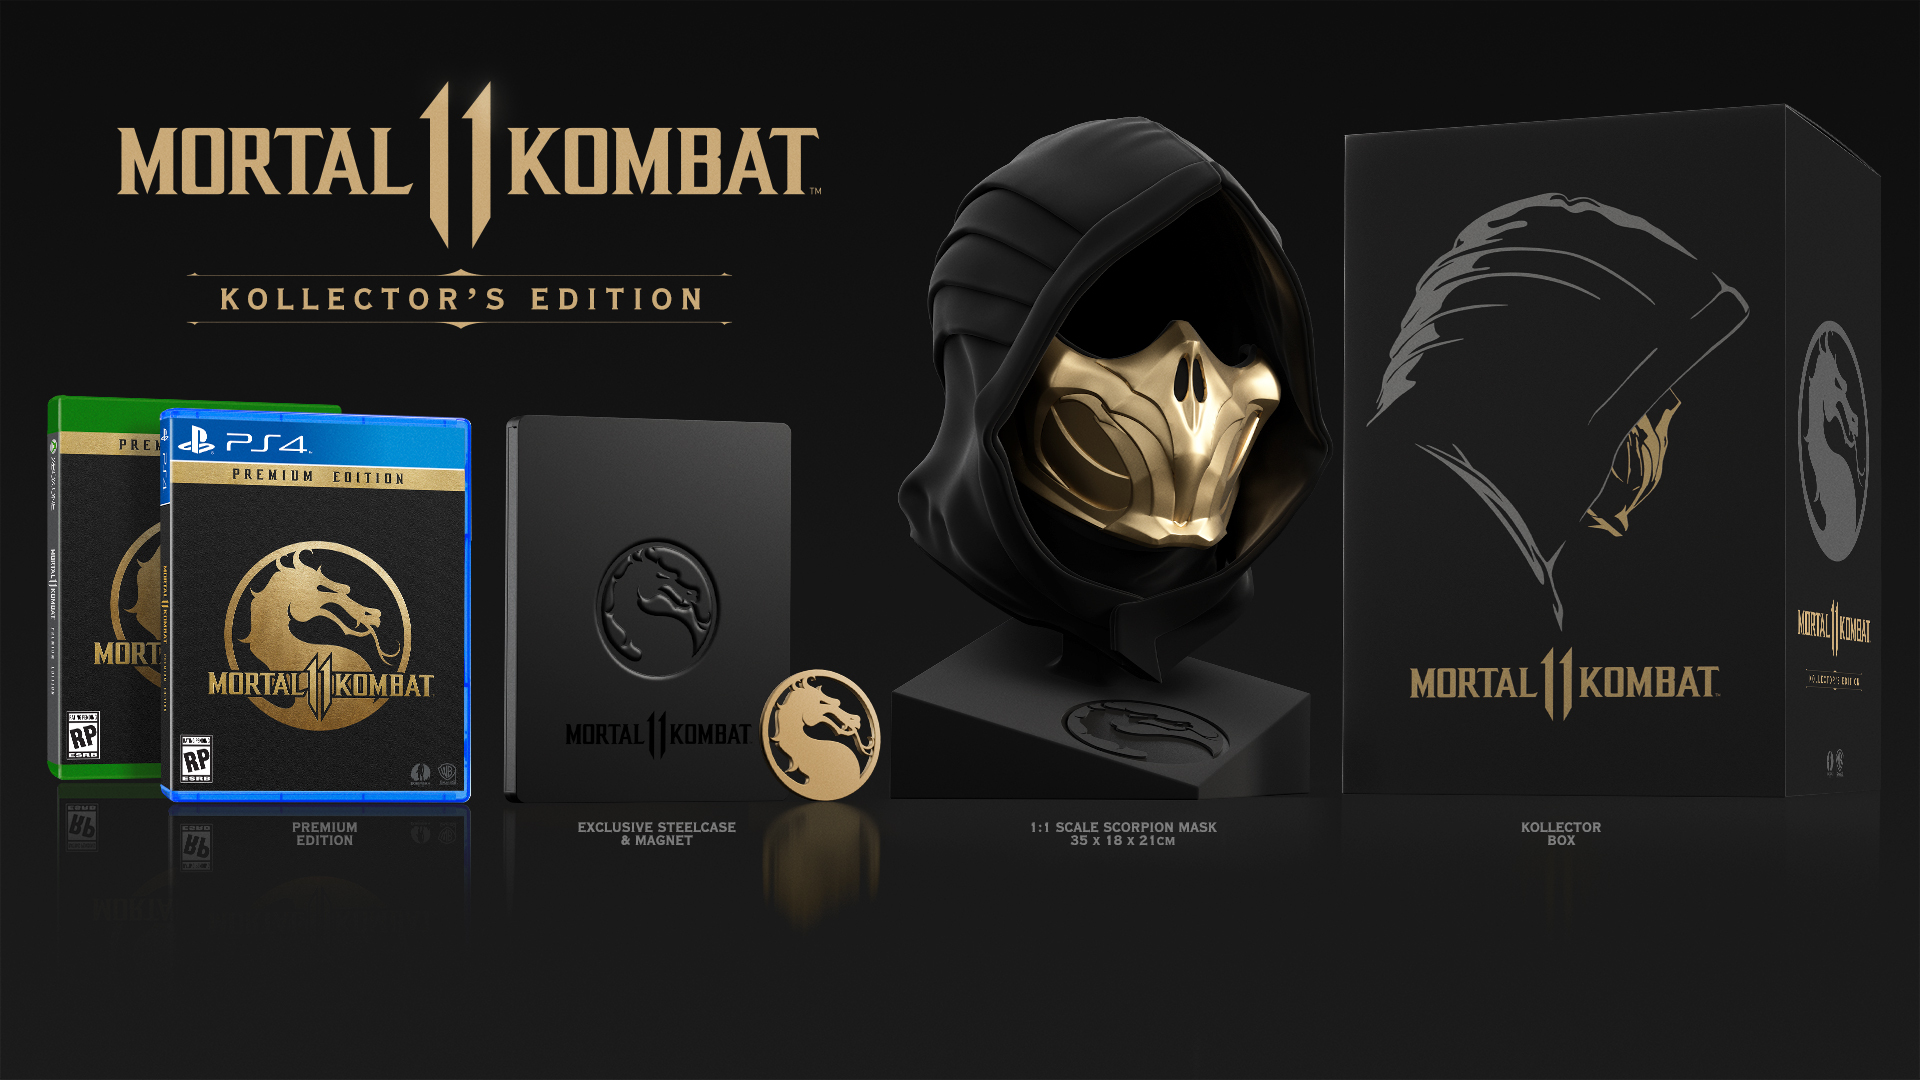 Mortal Kombat 11 Kollector S Edition Features 1 1 Replica